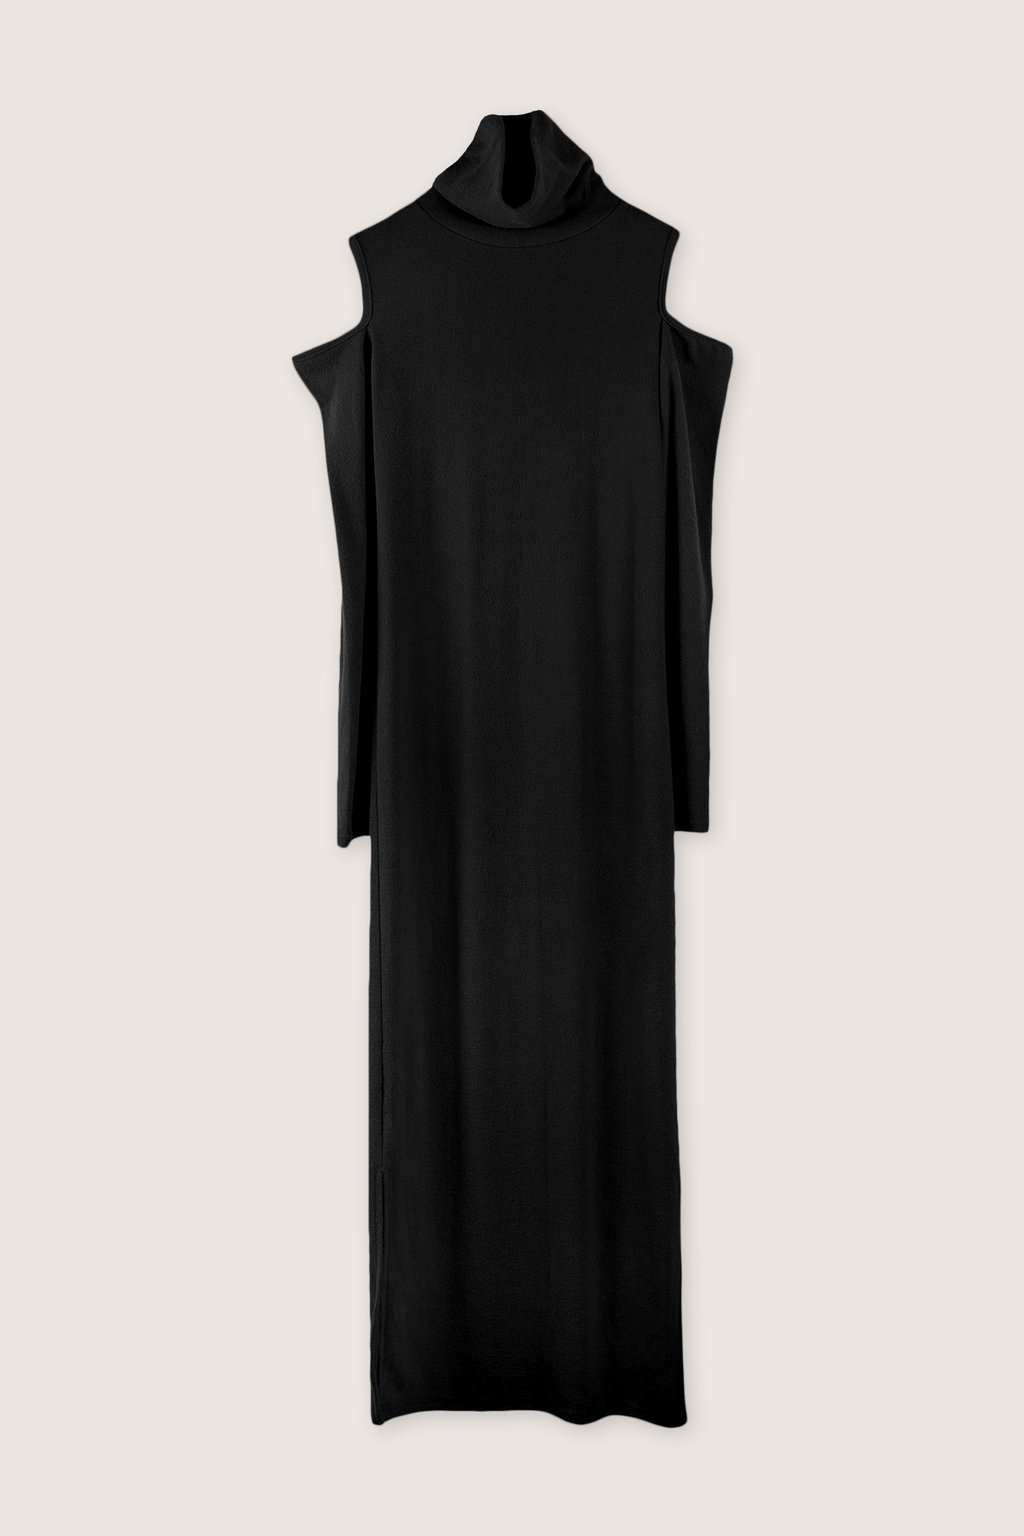 Dress H339 Black 7